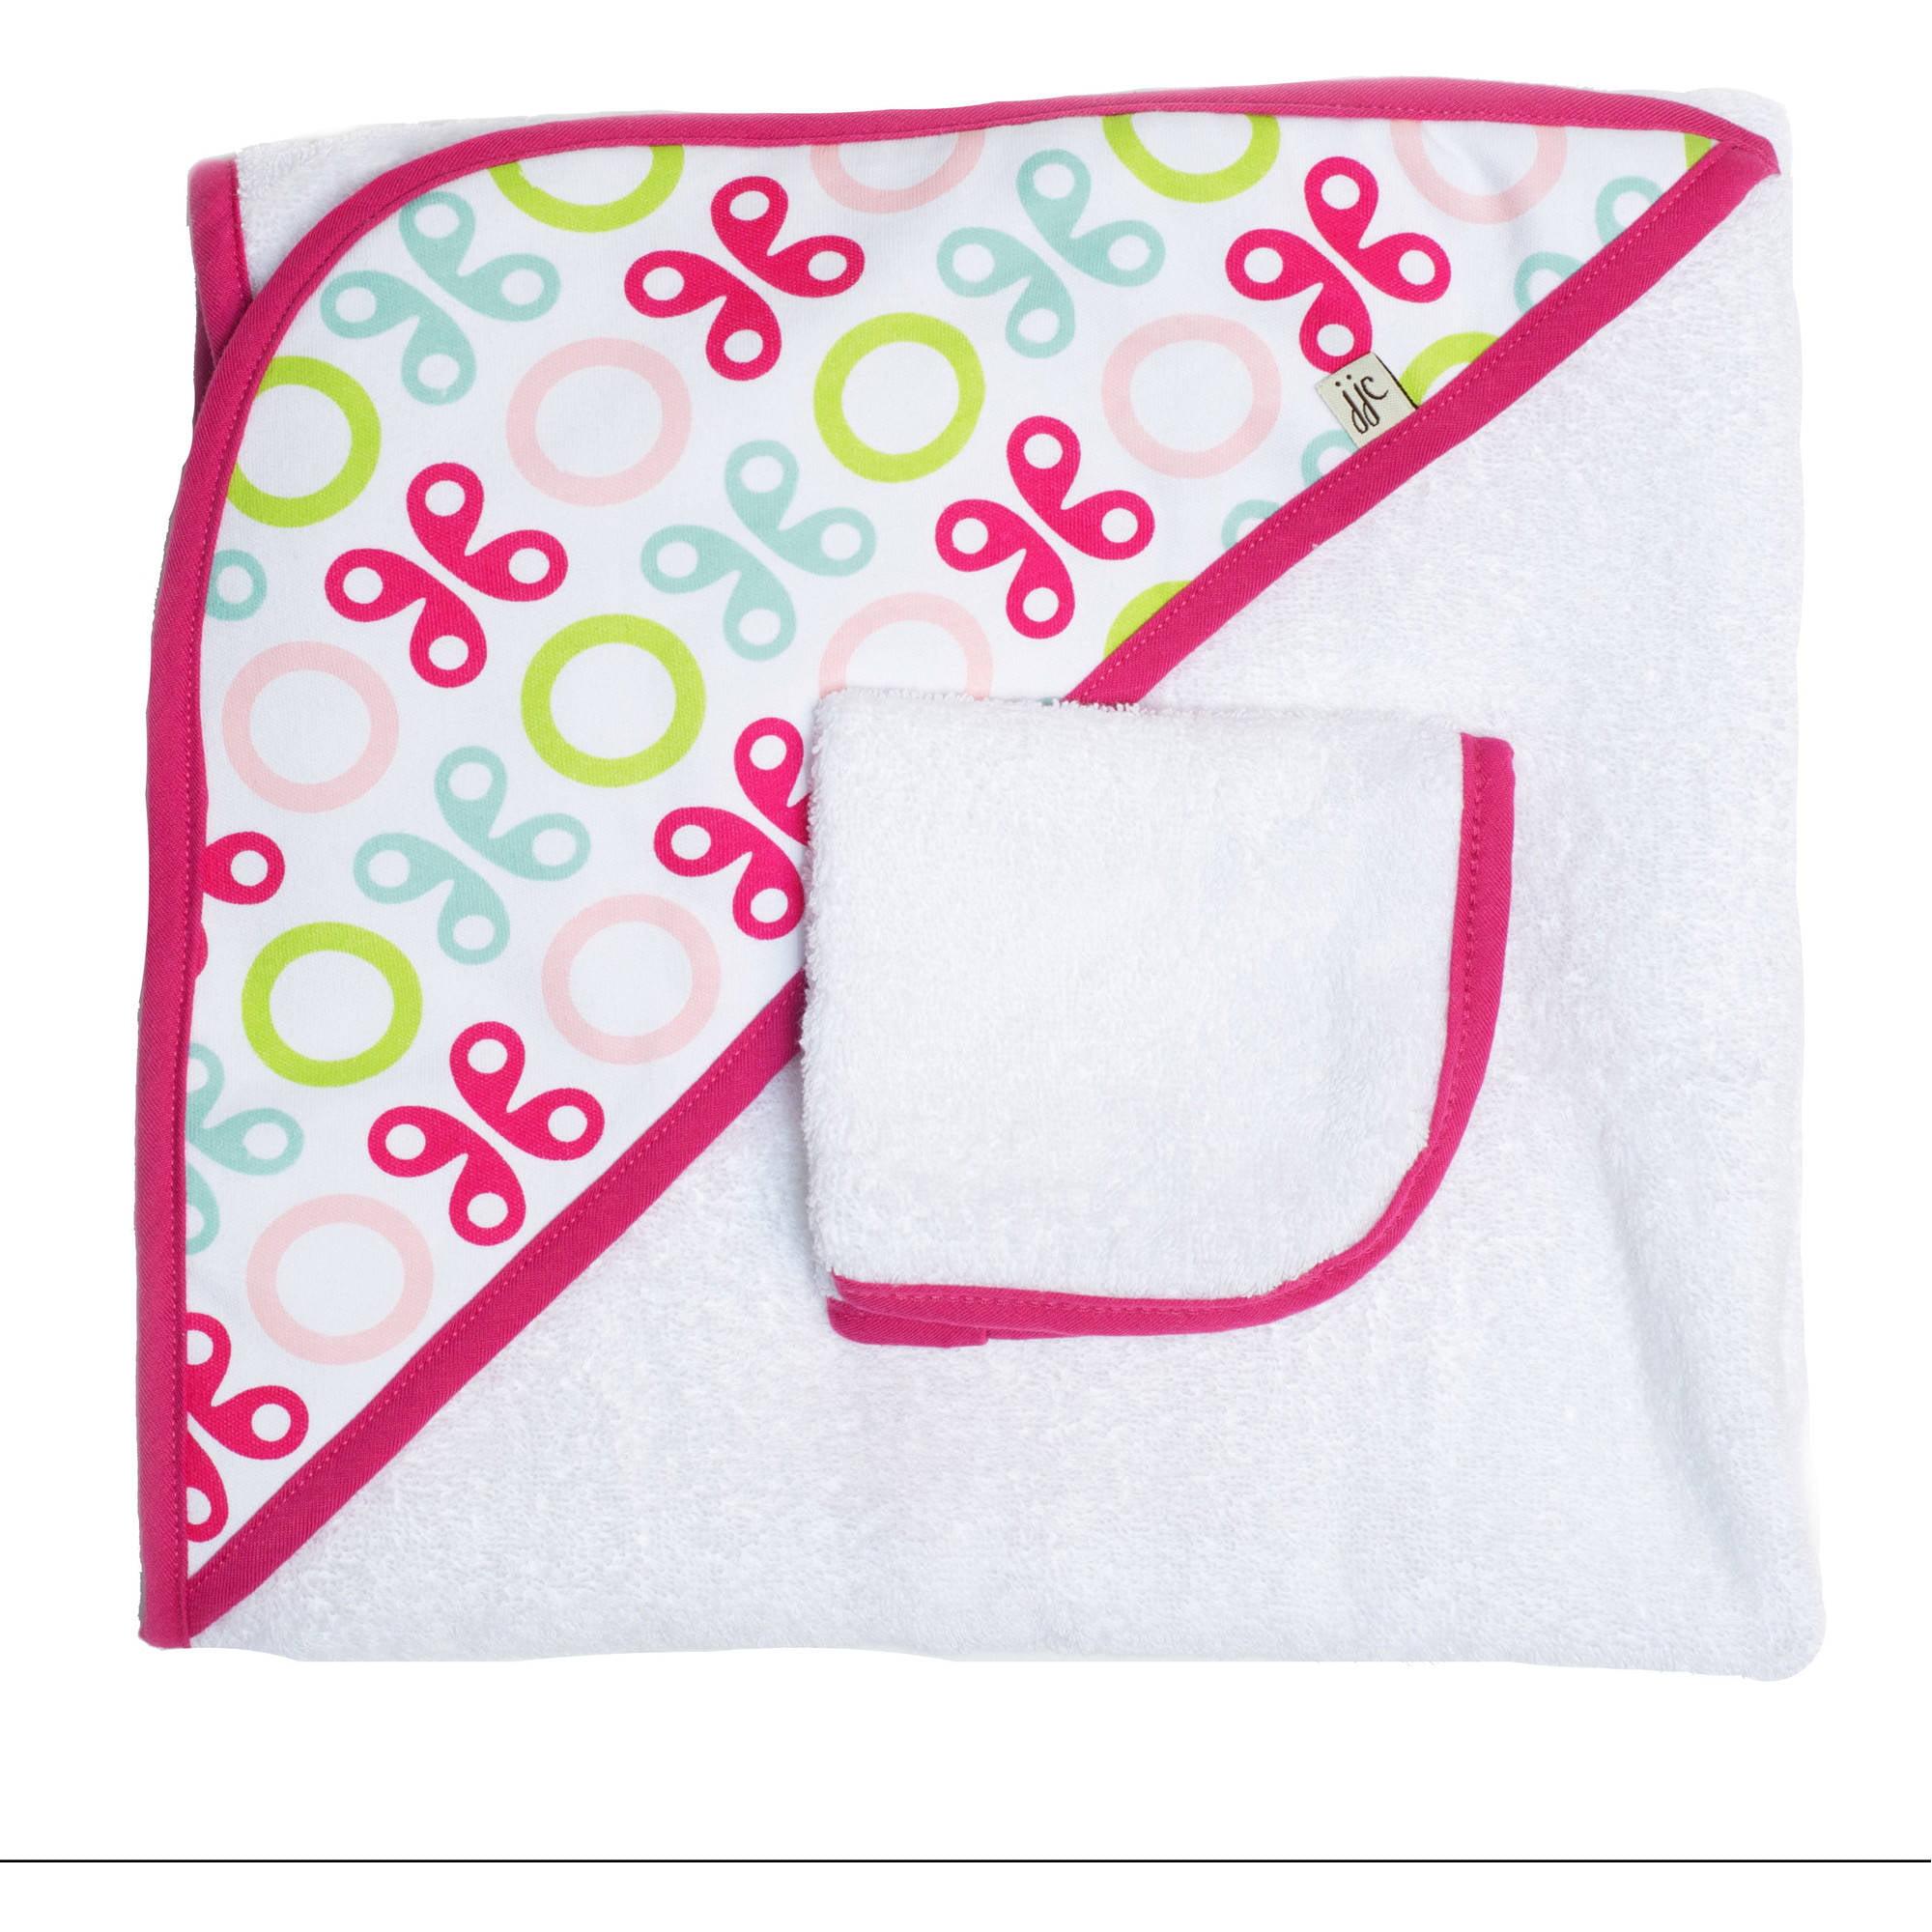 JJ Cole Hooded Towel Set, Pink Butterfly